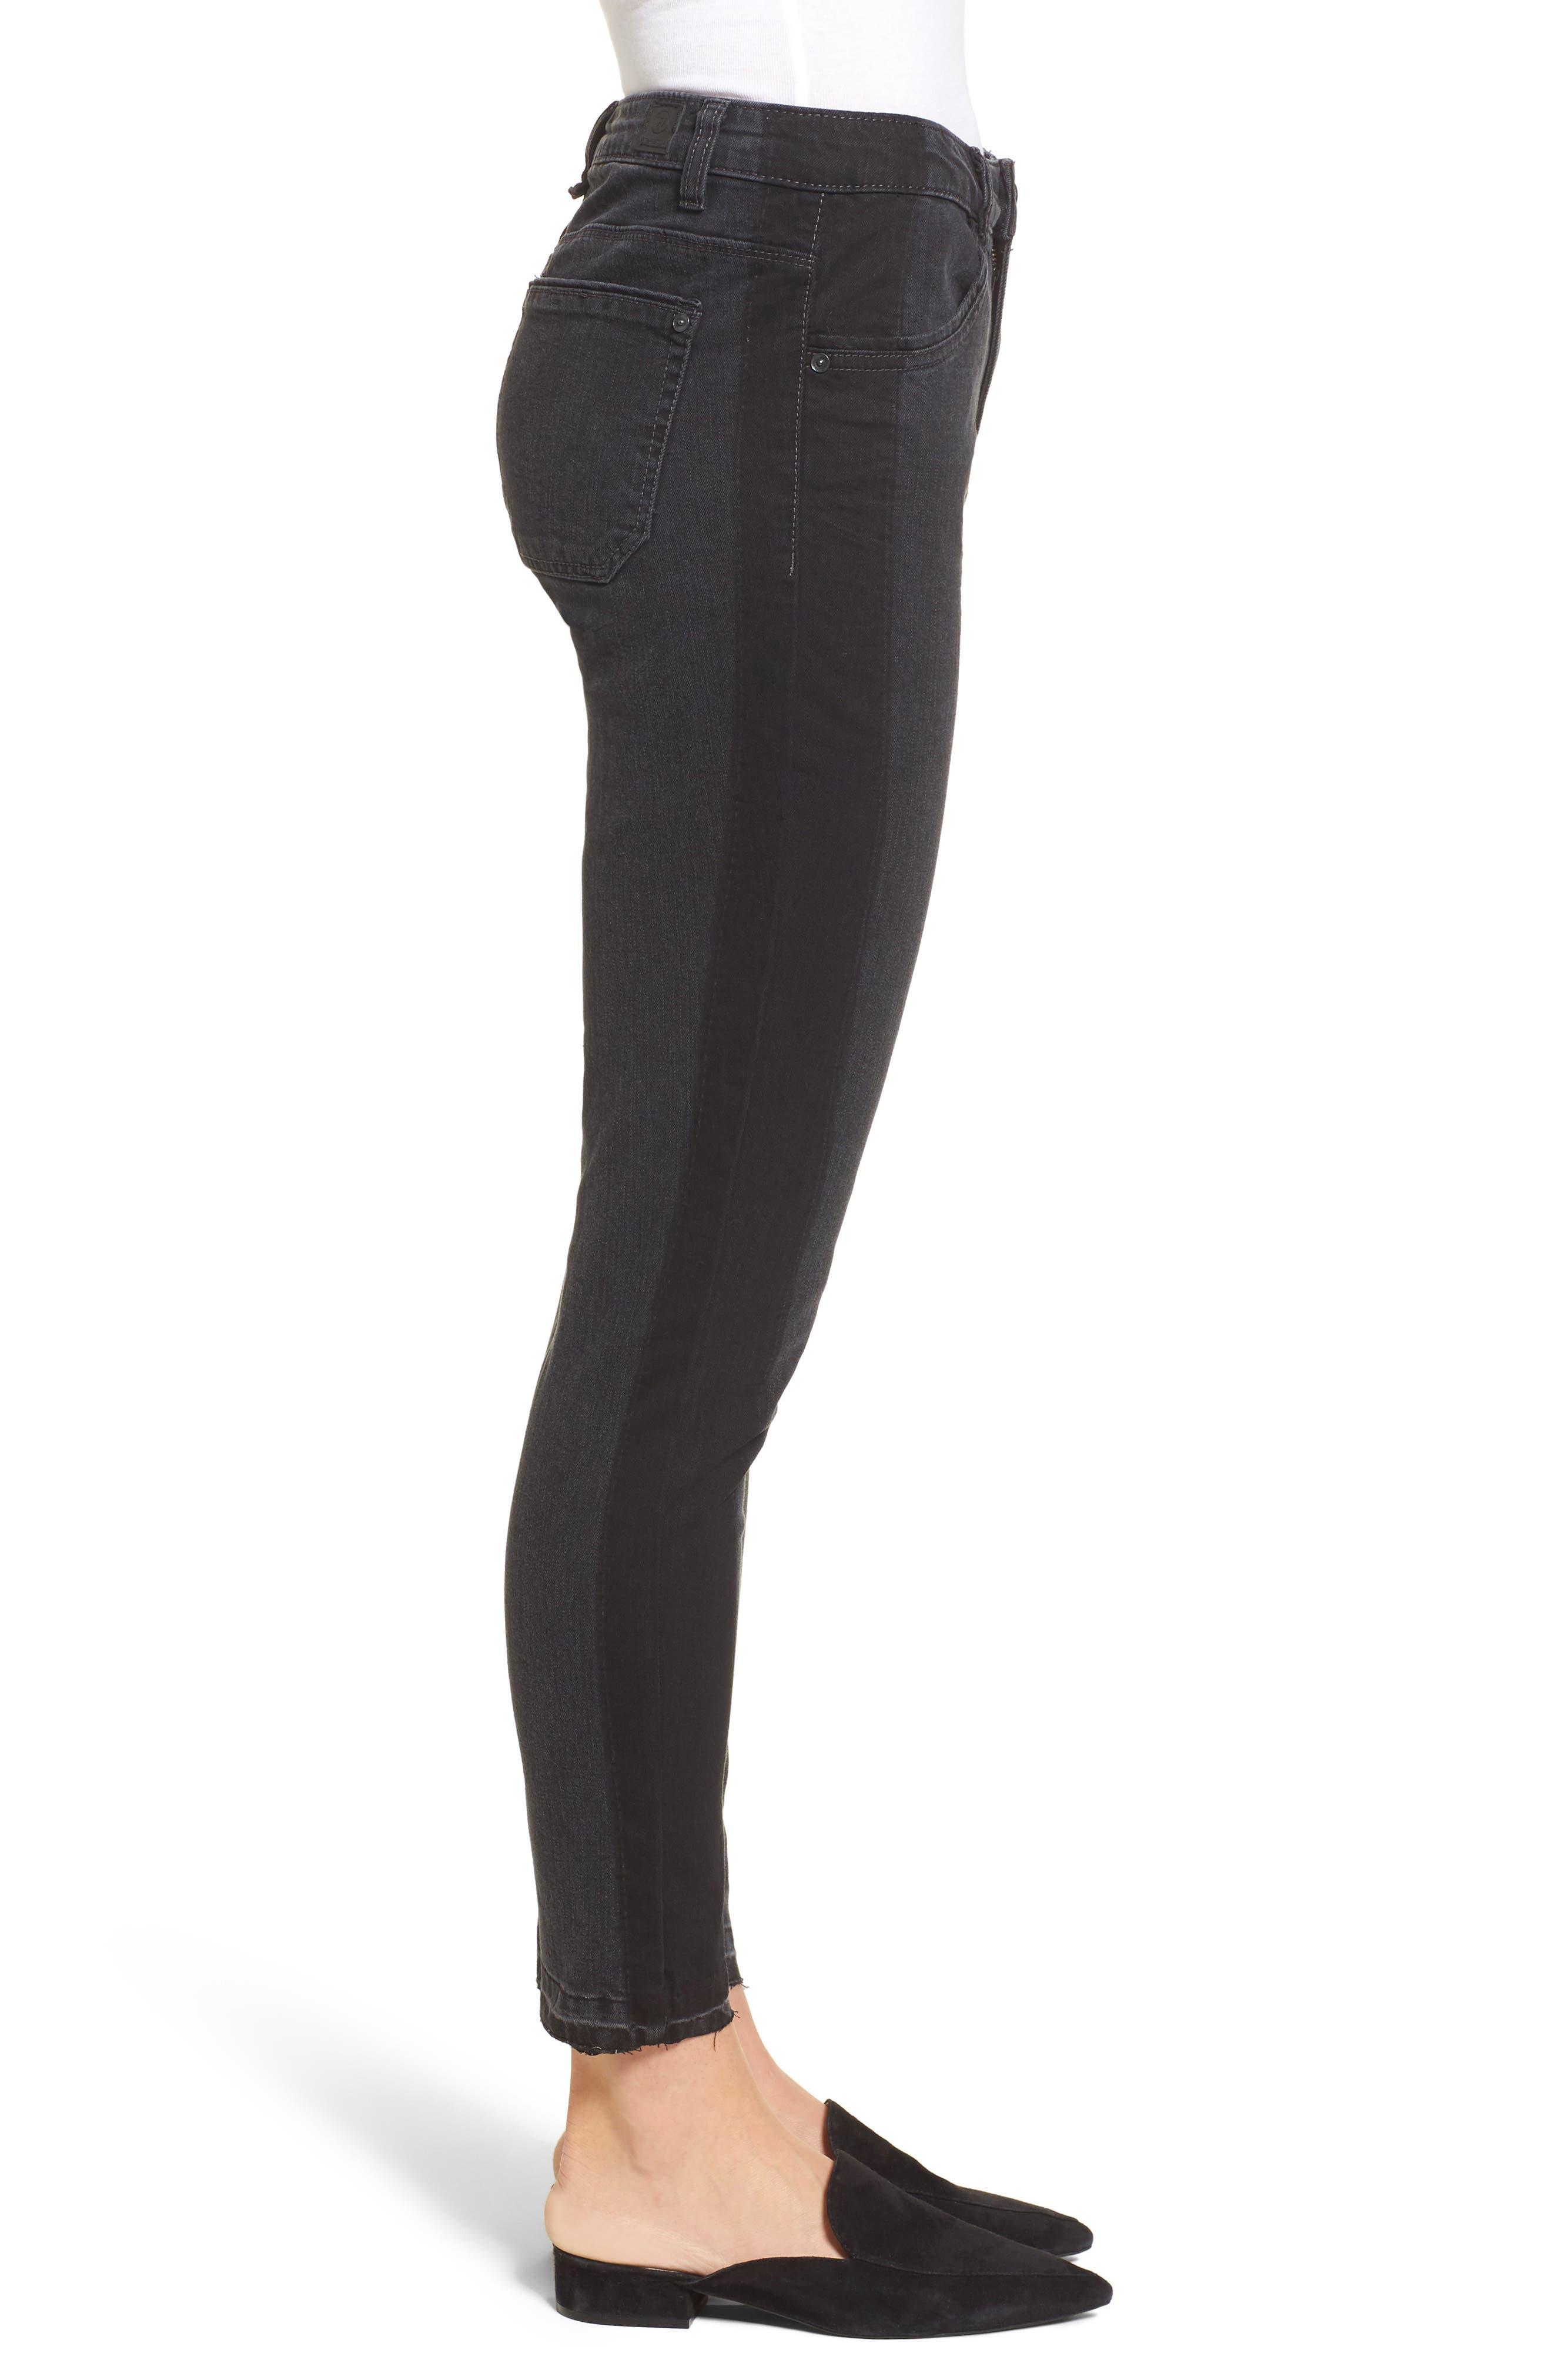 Alternate Image 3  - Wit & Wisdom Tuxedo Stripe Skinny Jeans (Nordstrom Exclusive) (Regular & Petite)